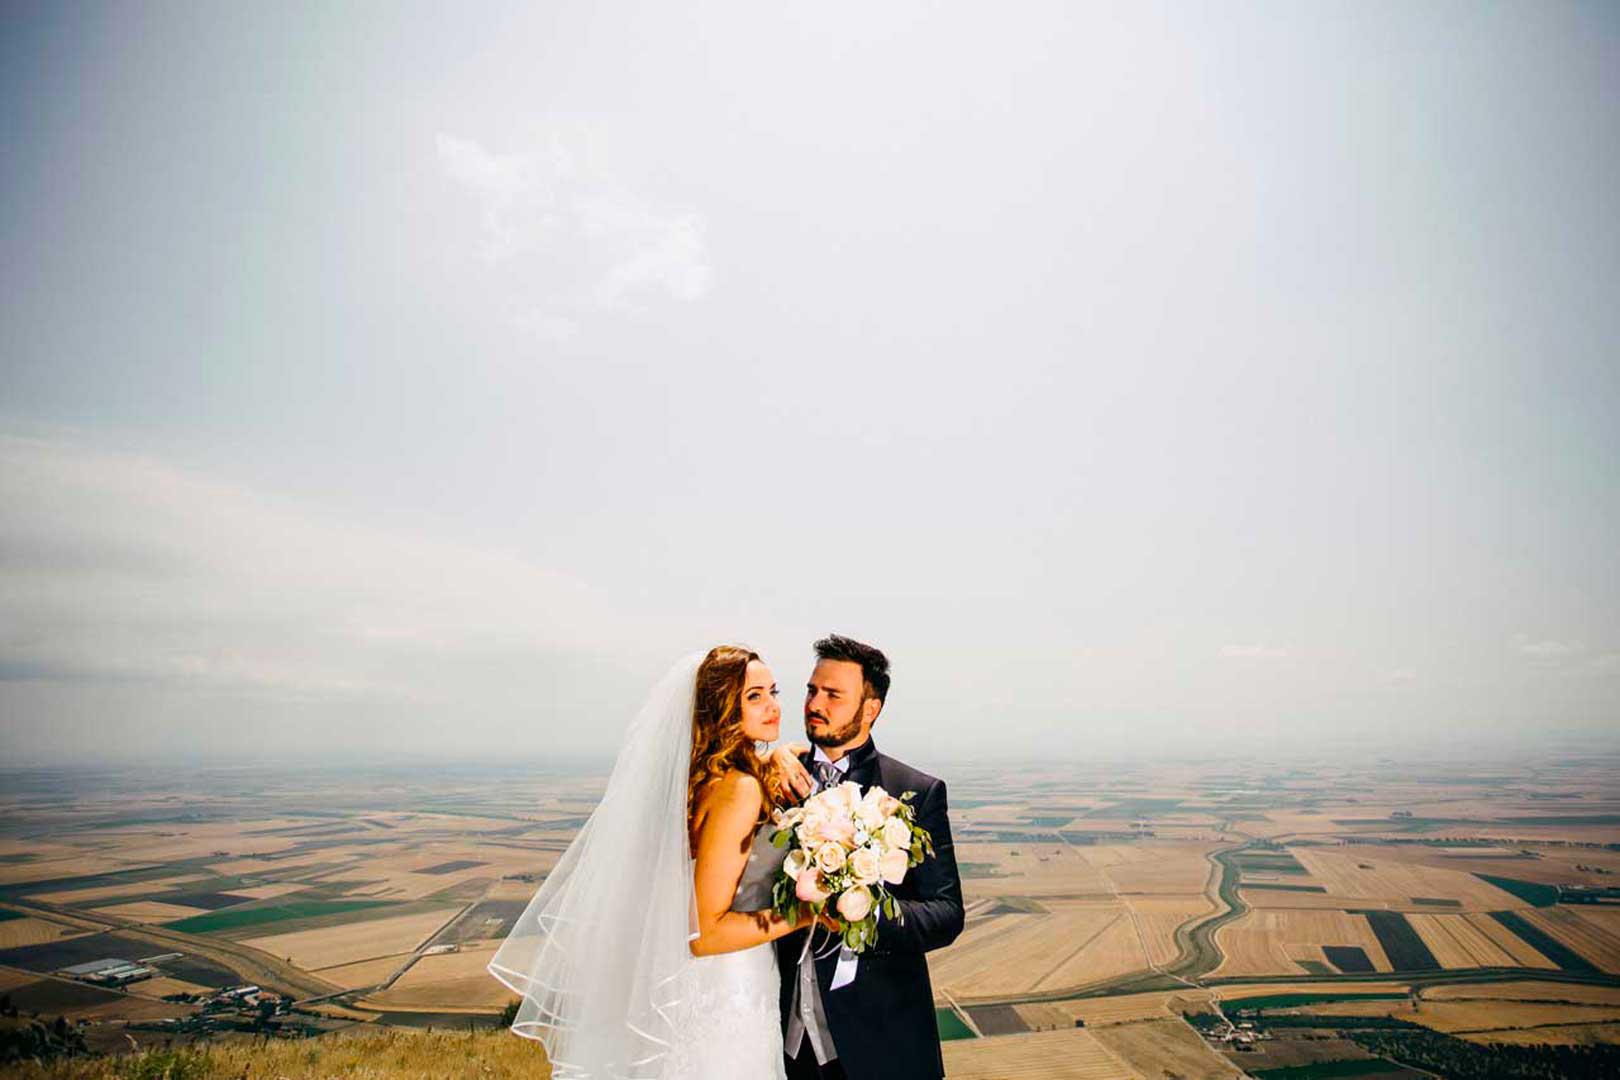 019-matrimonio-gargano-gianni-lepore-fotografo